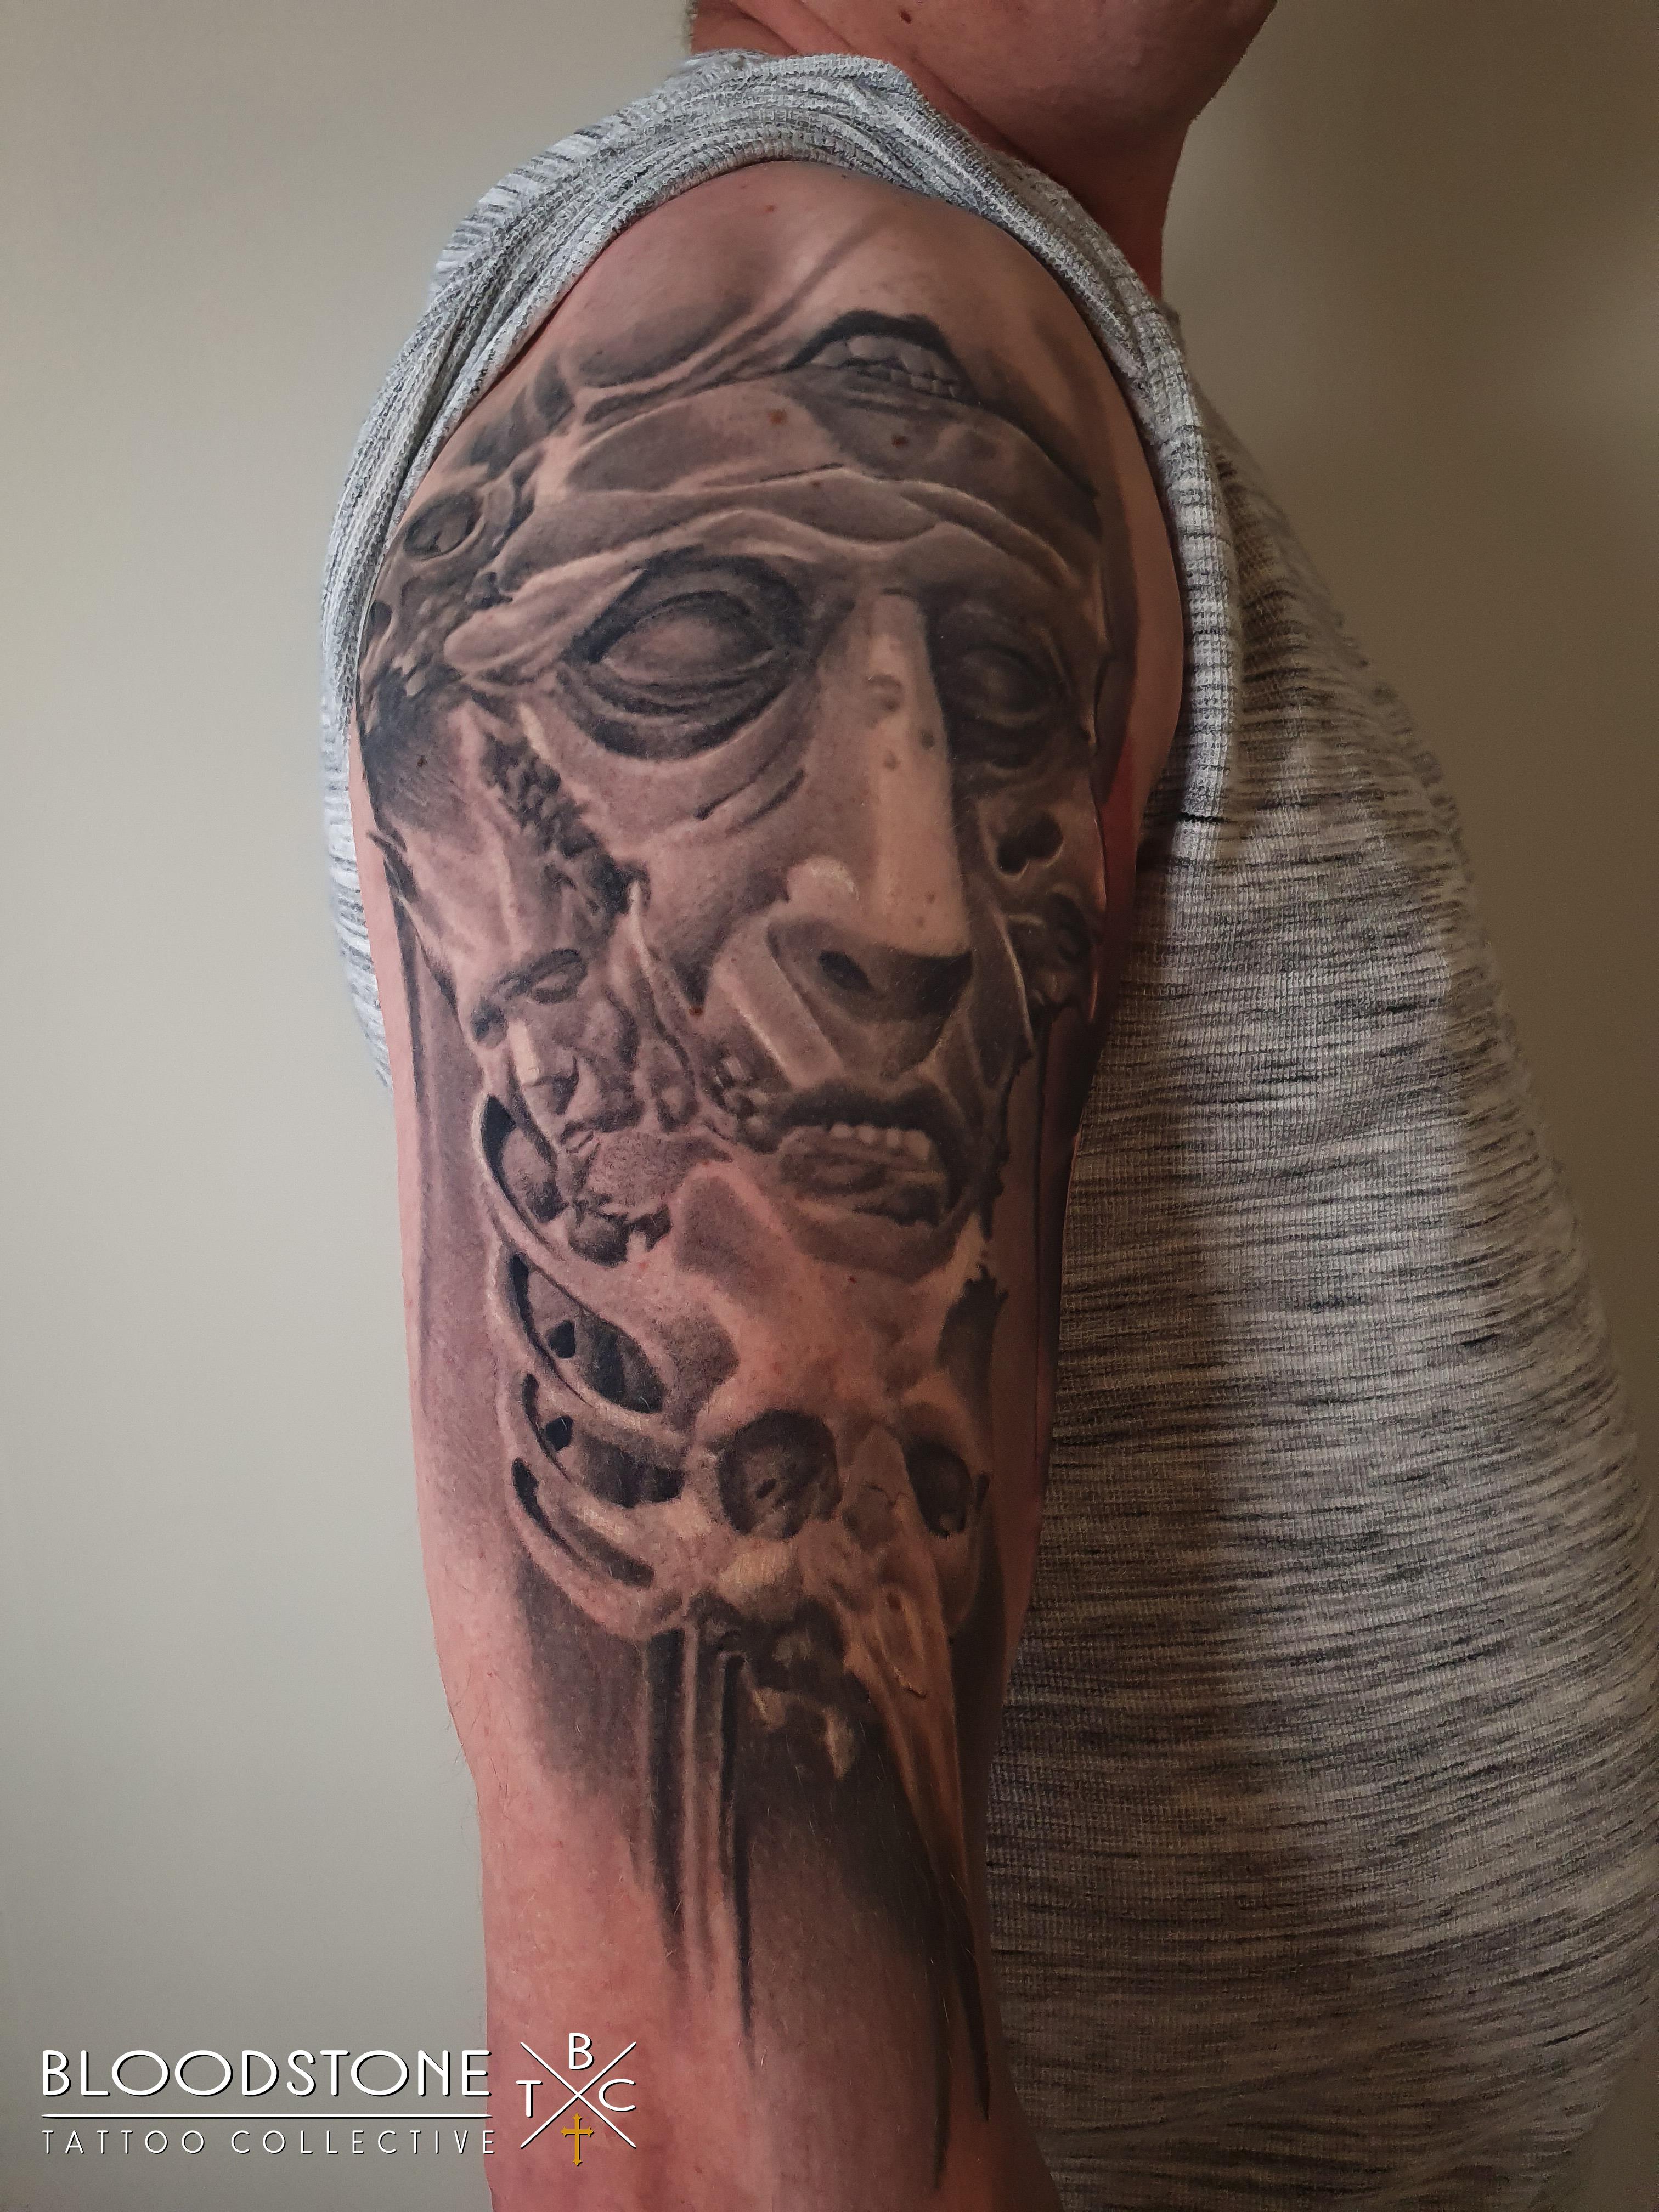 Healed creepy faces and skulls